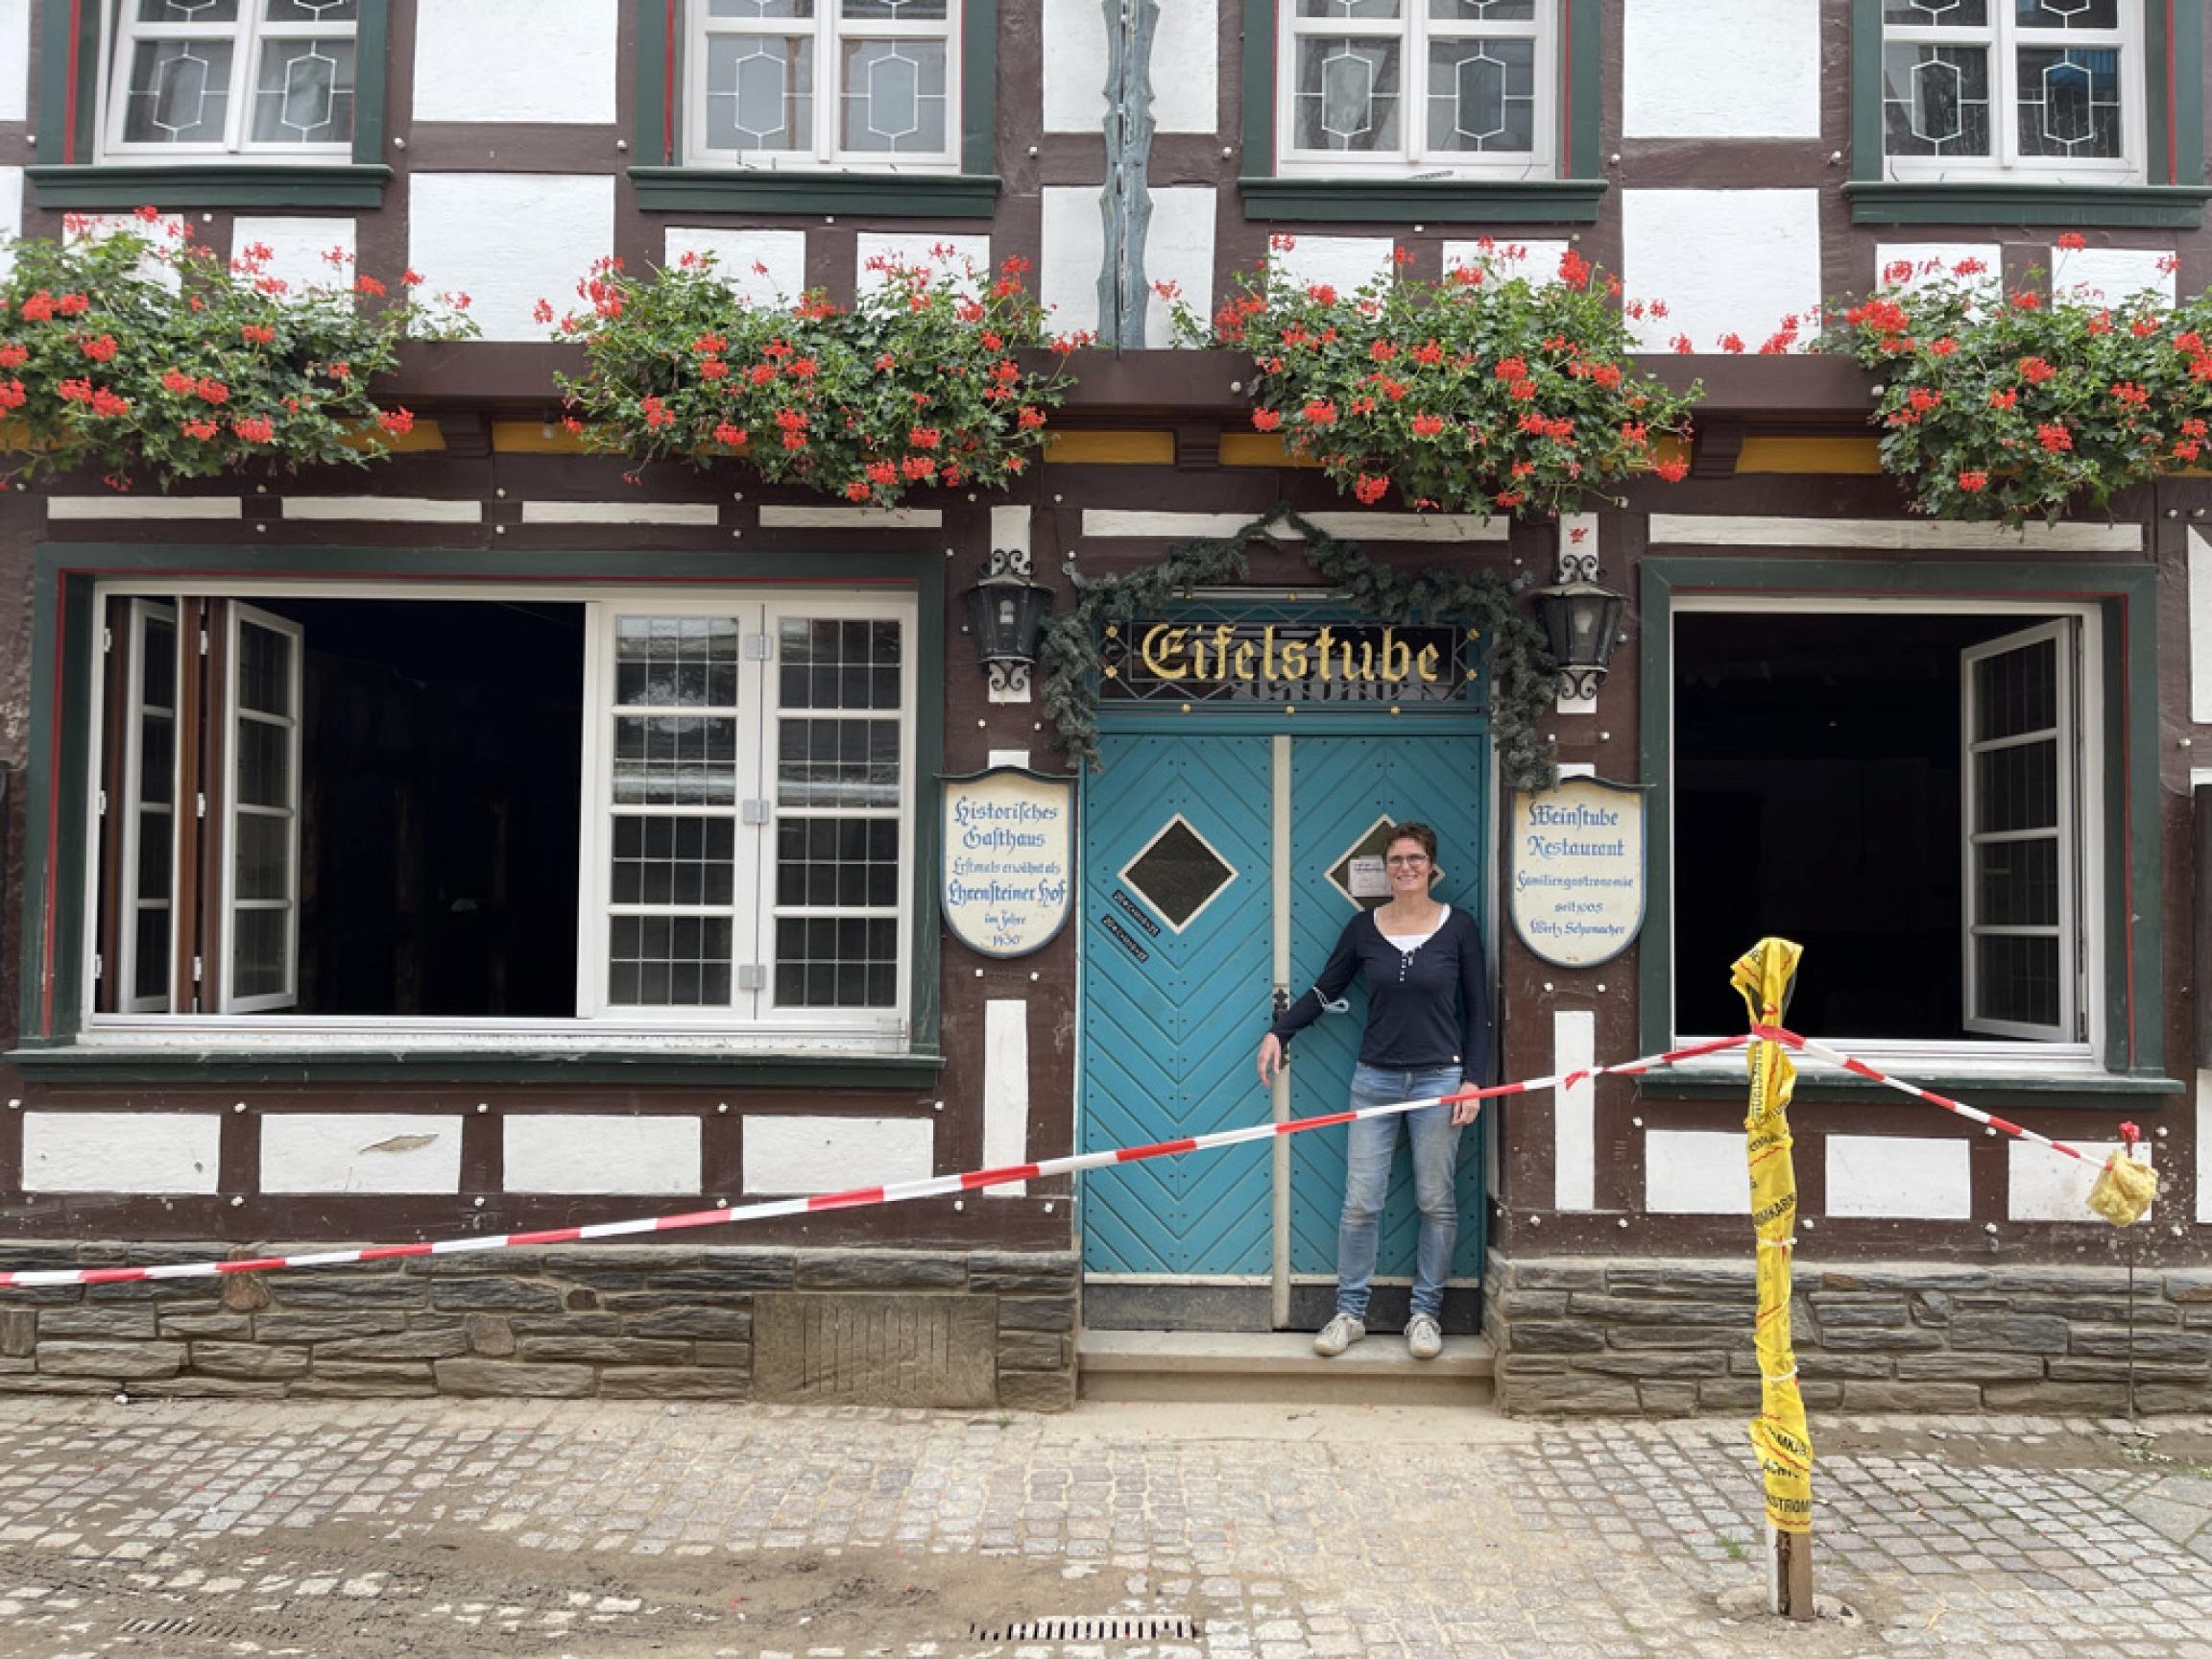 Manuela Schumacher stands amid the ruins of her Eifelstube Restaurant in Bad Neuenahr-Ahrweiler in western Germany in the aftermath of the flood.